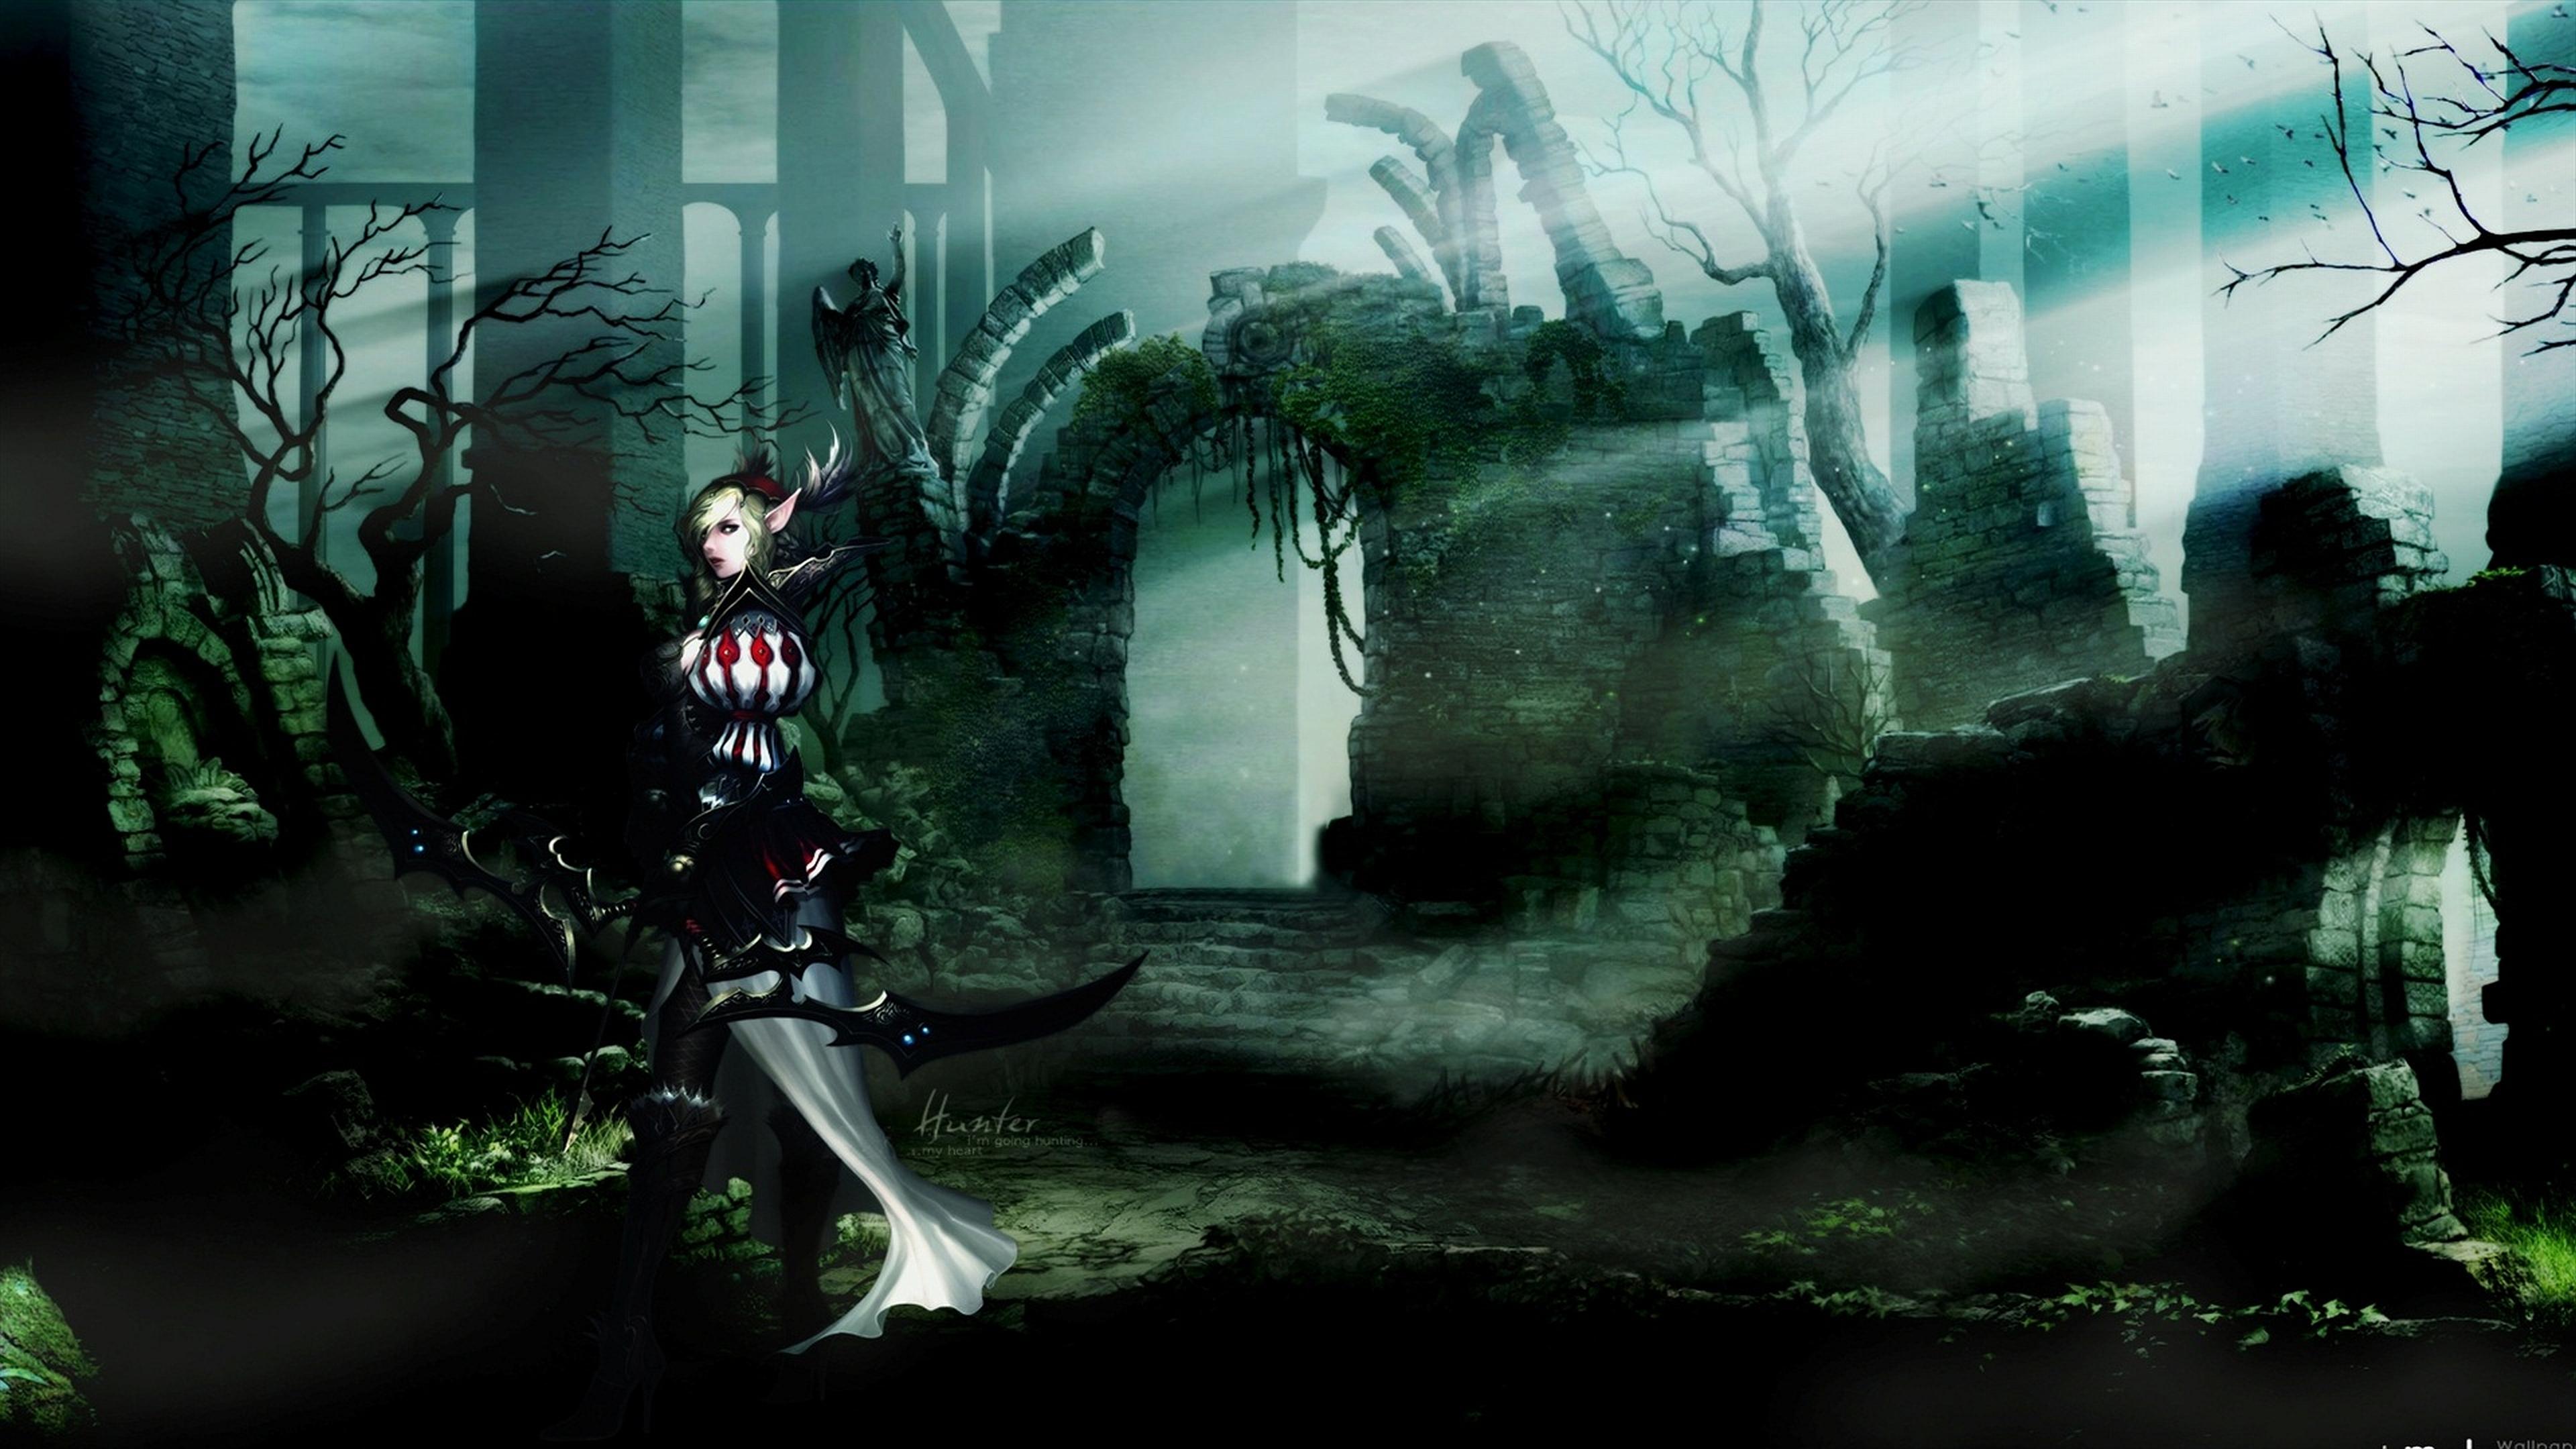 Dark Souls Wallpapers - WallpaperVortex.com